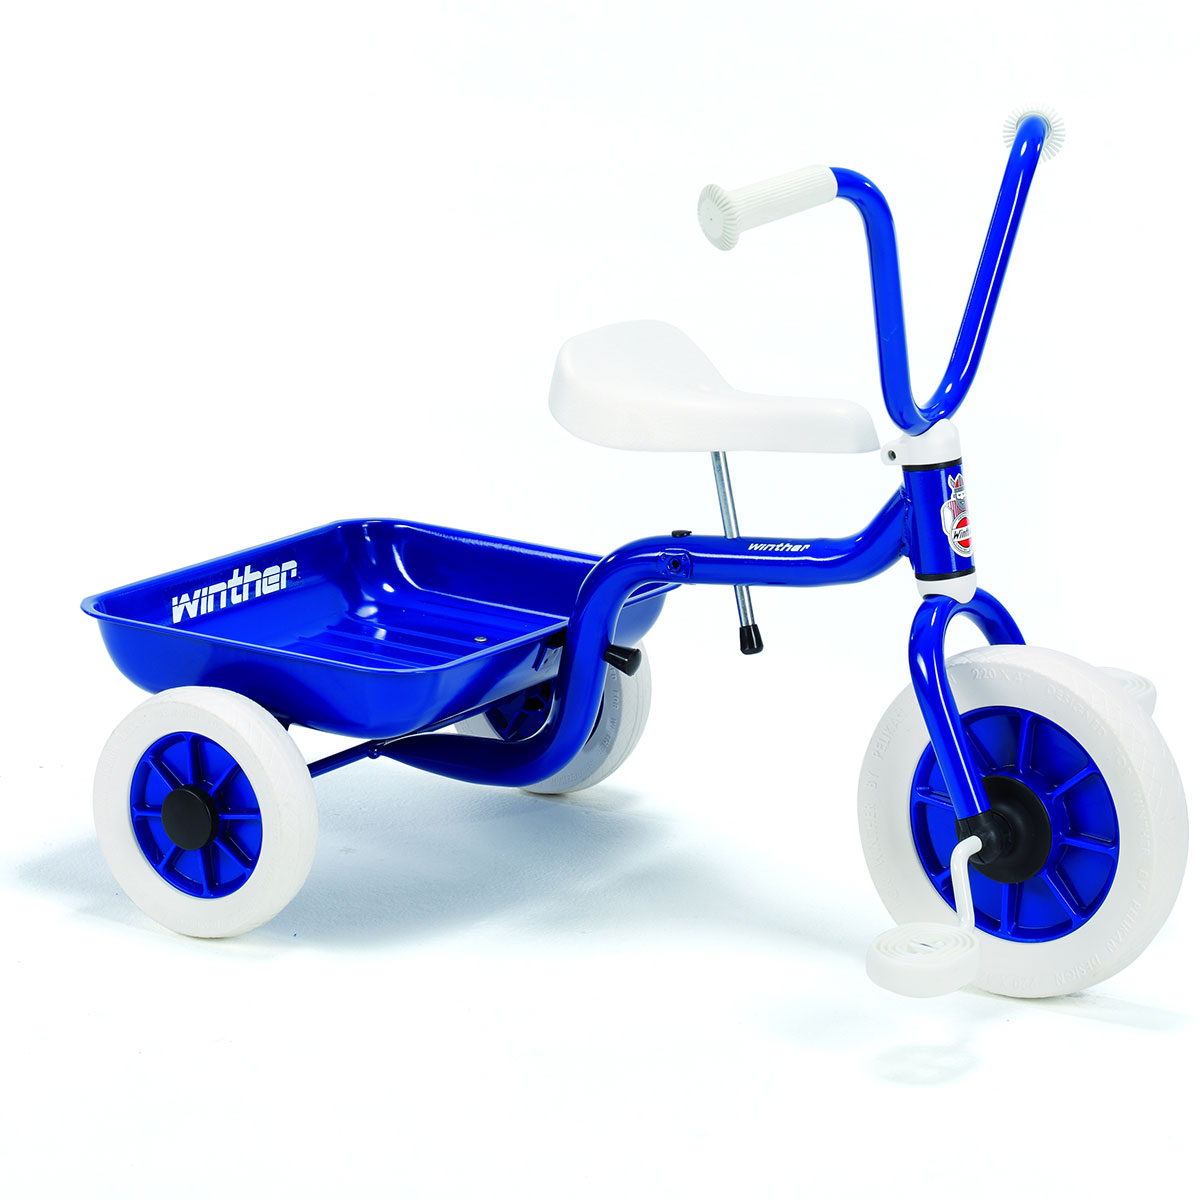 Winther trehjulet cykel - Mørkeblå